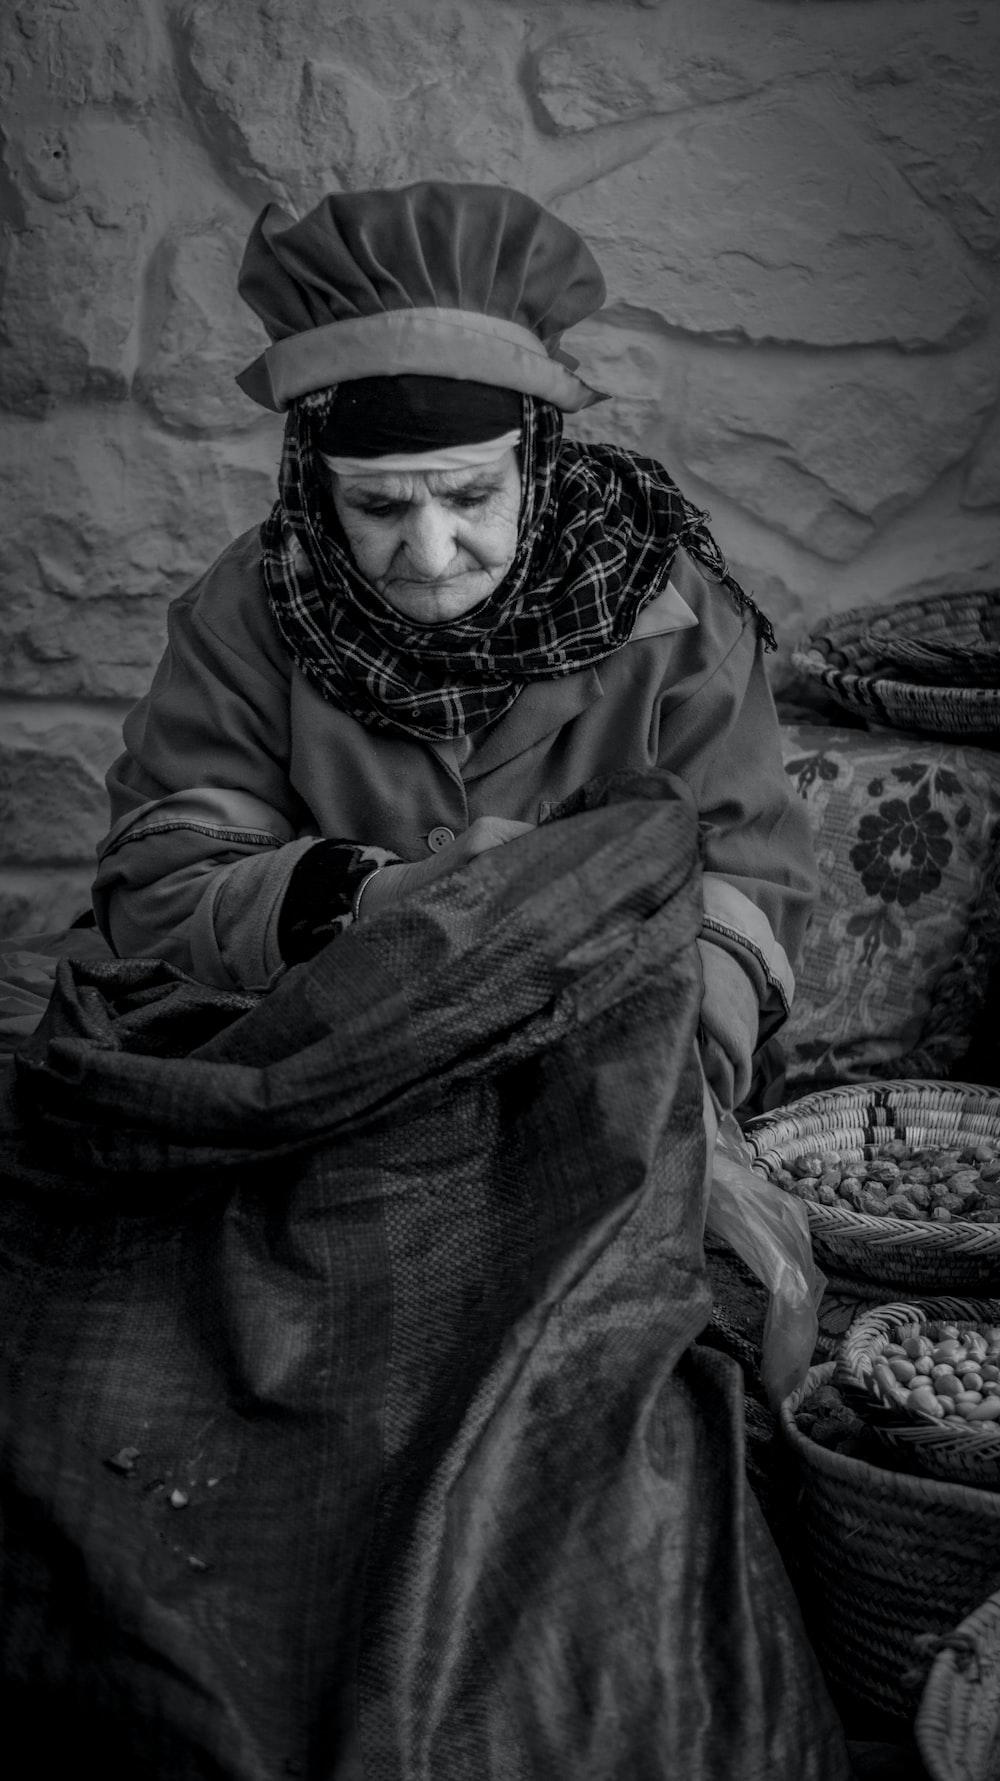 grayscale photo of woman sitting near baskets